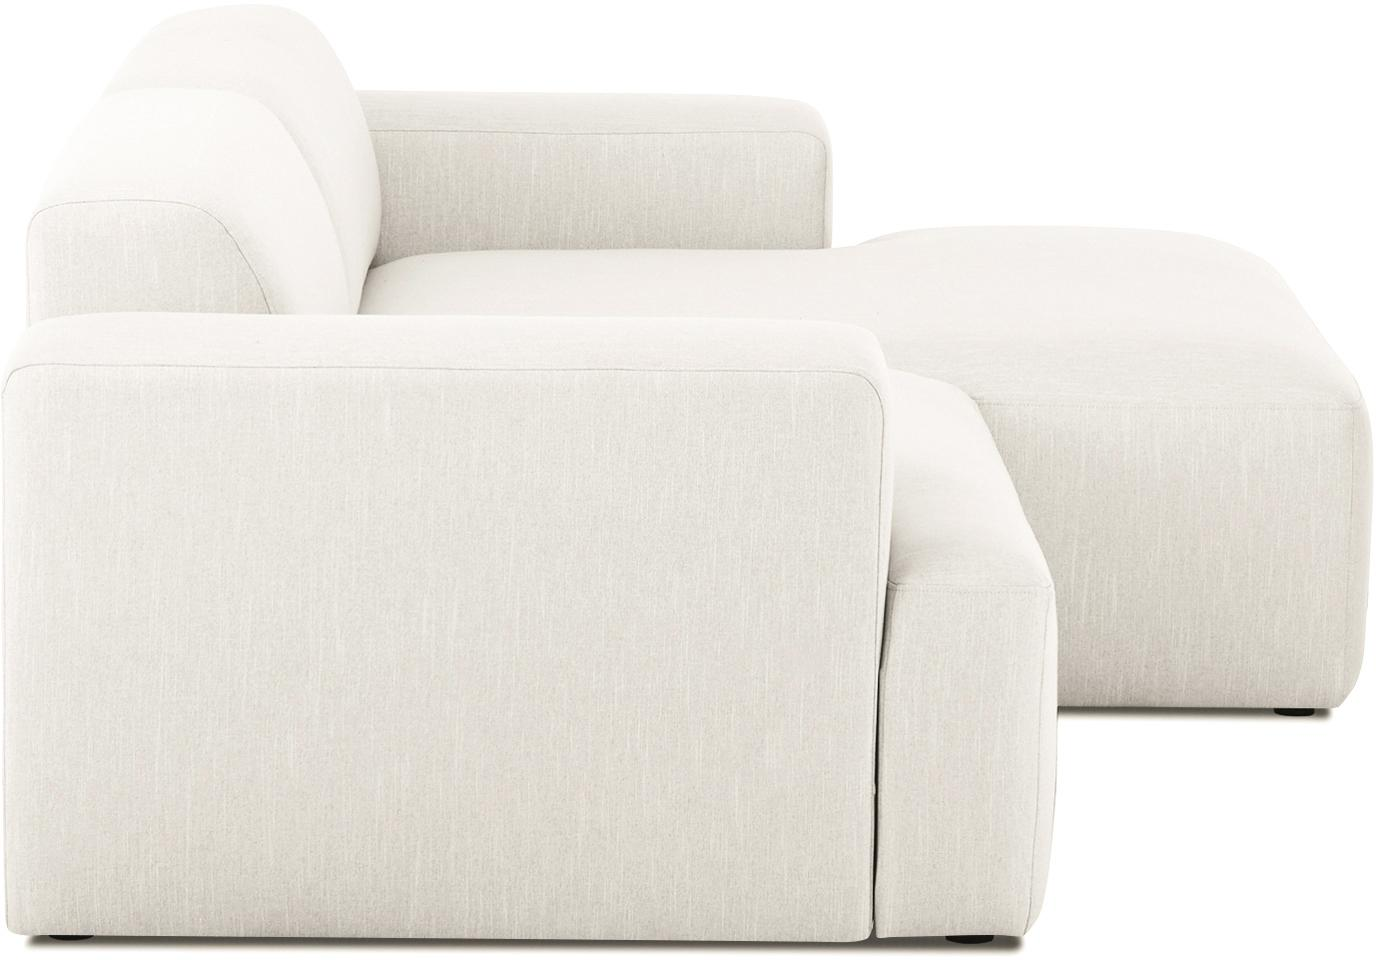 Hoekbank Melva (3-zits), Bekleding: polyester, Frame: massief grenenhout, spaan, Poten: grenenhout, Geweven stof beige, B 240 x D 144 cm